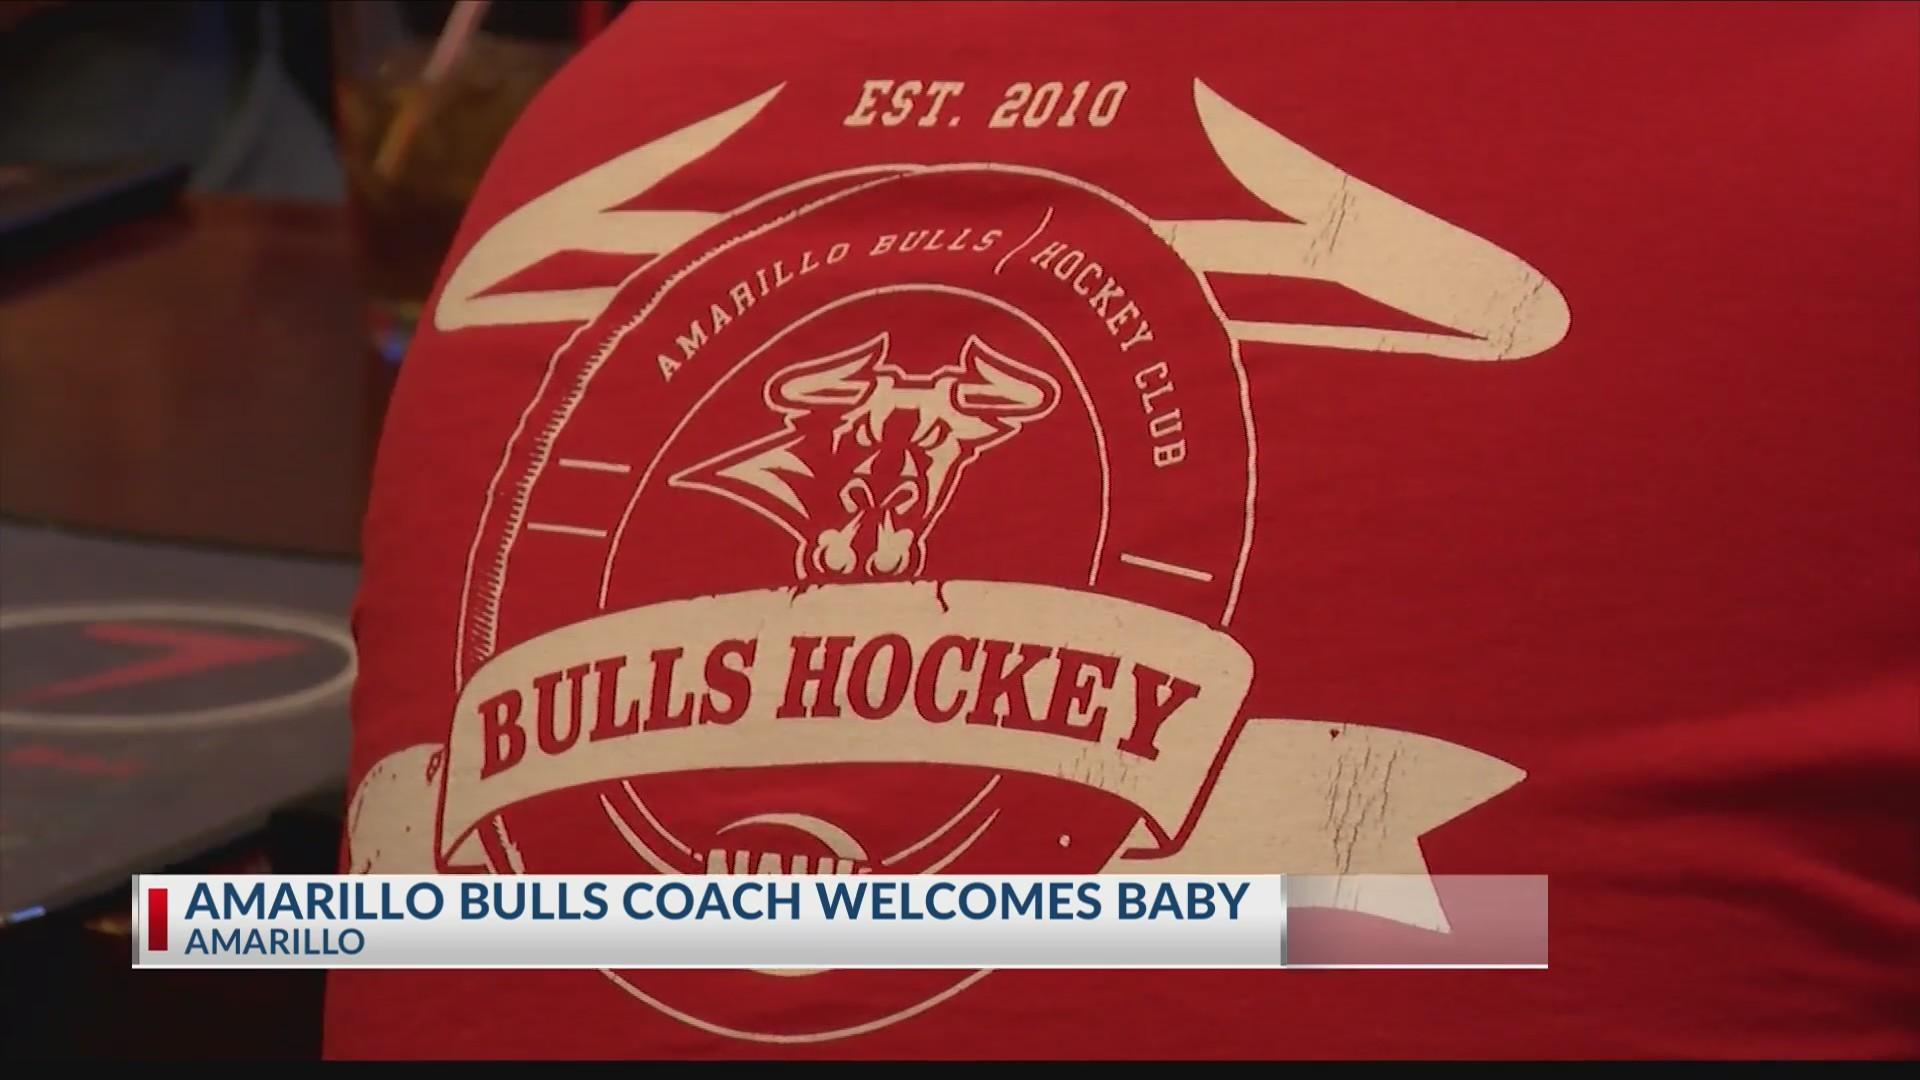 Amarillo Bulls coach welcomes baby